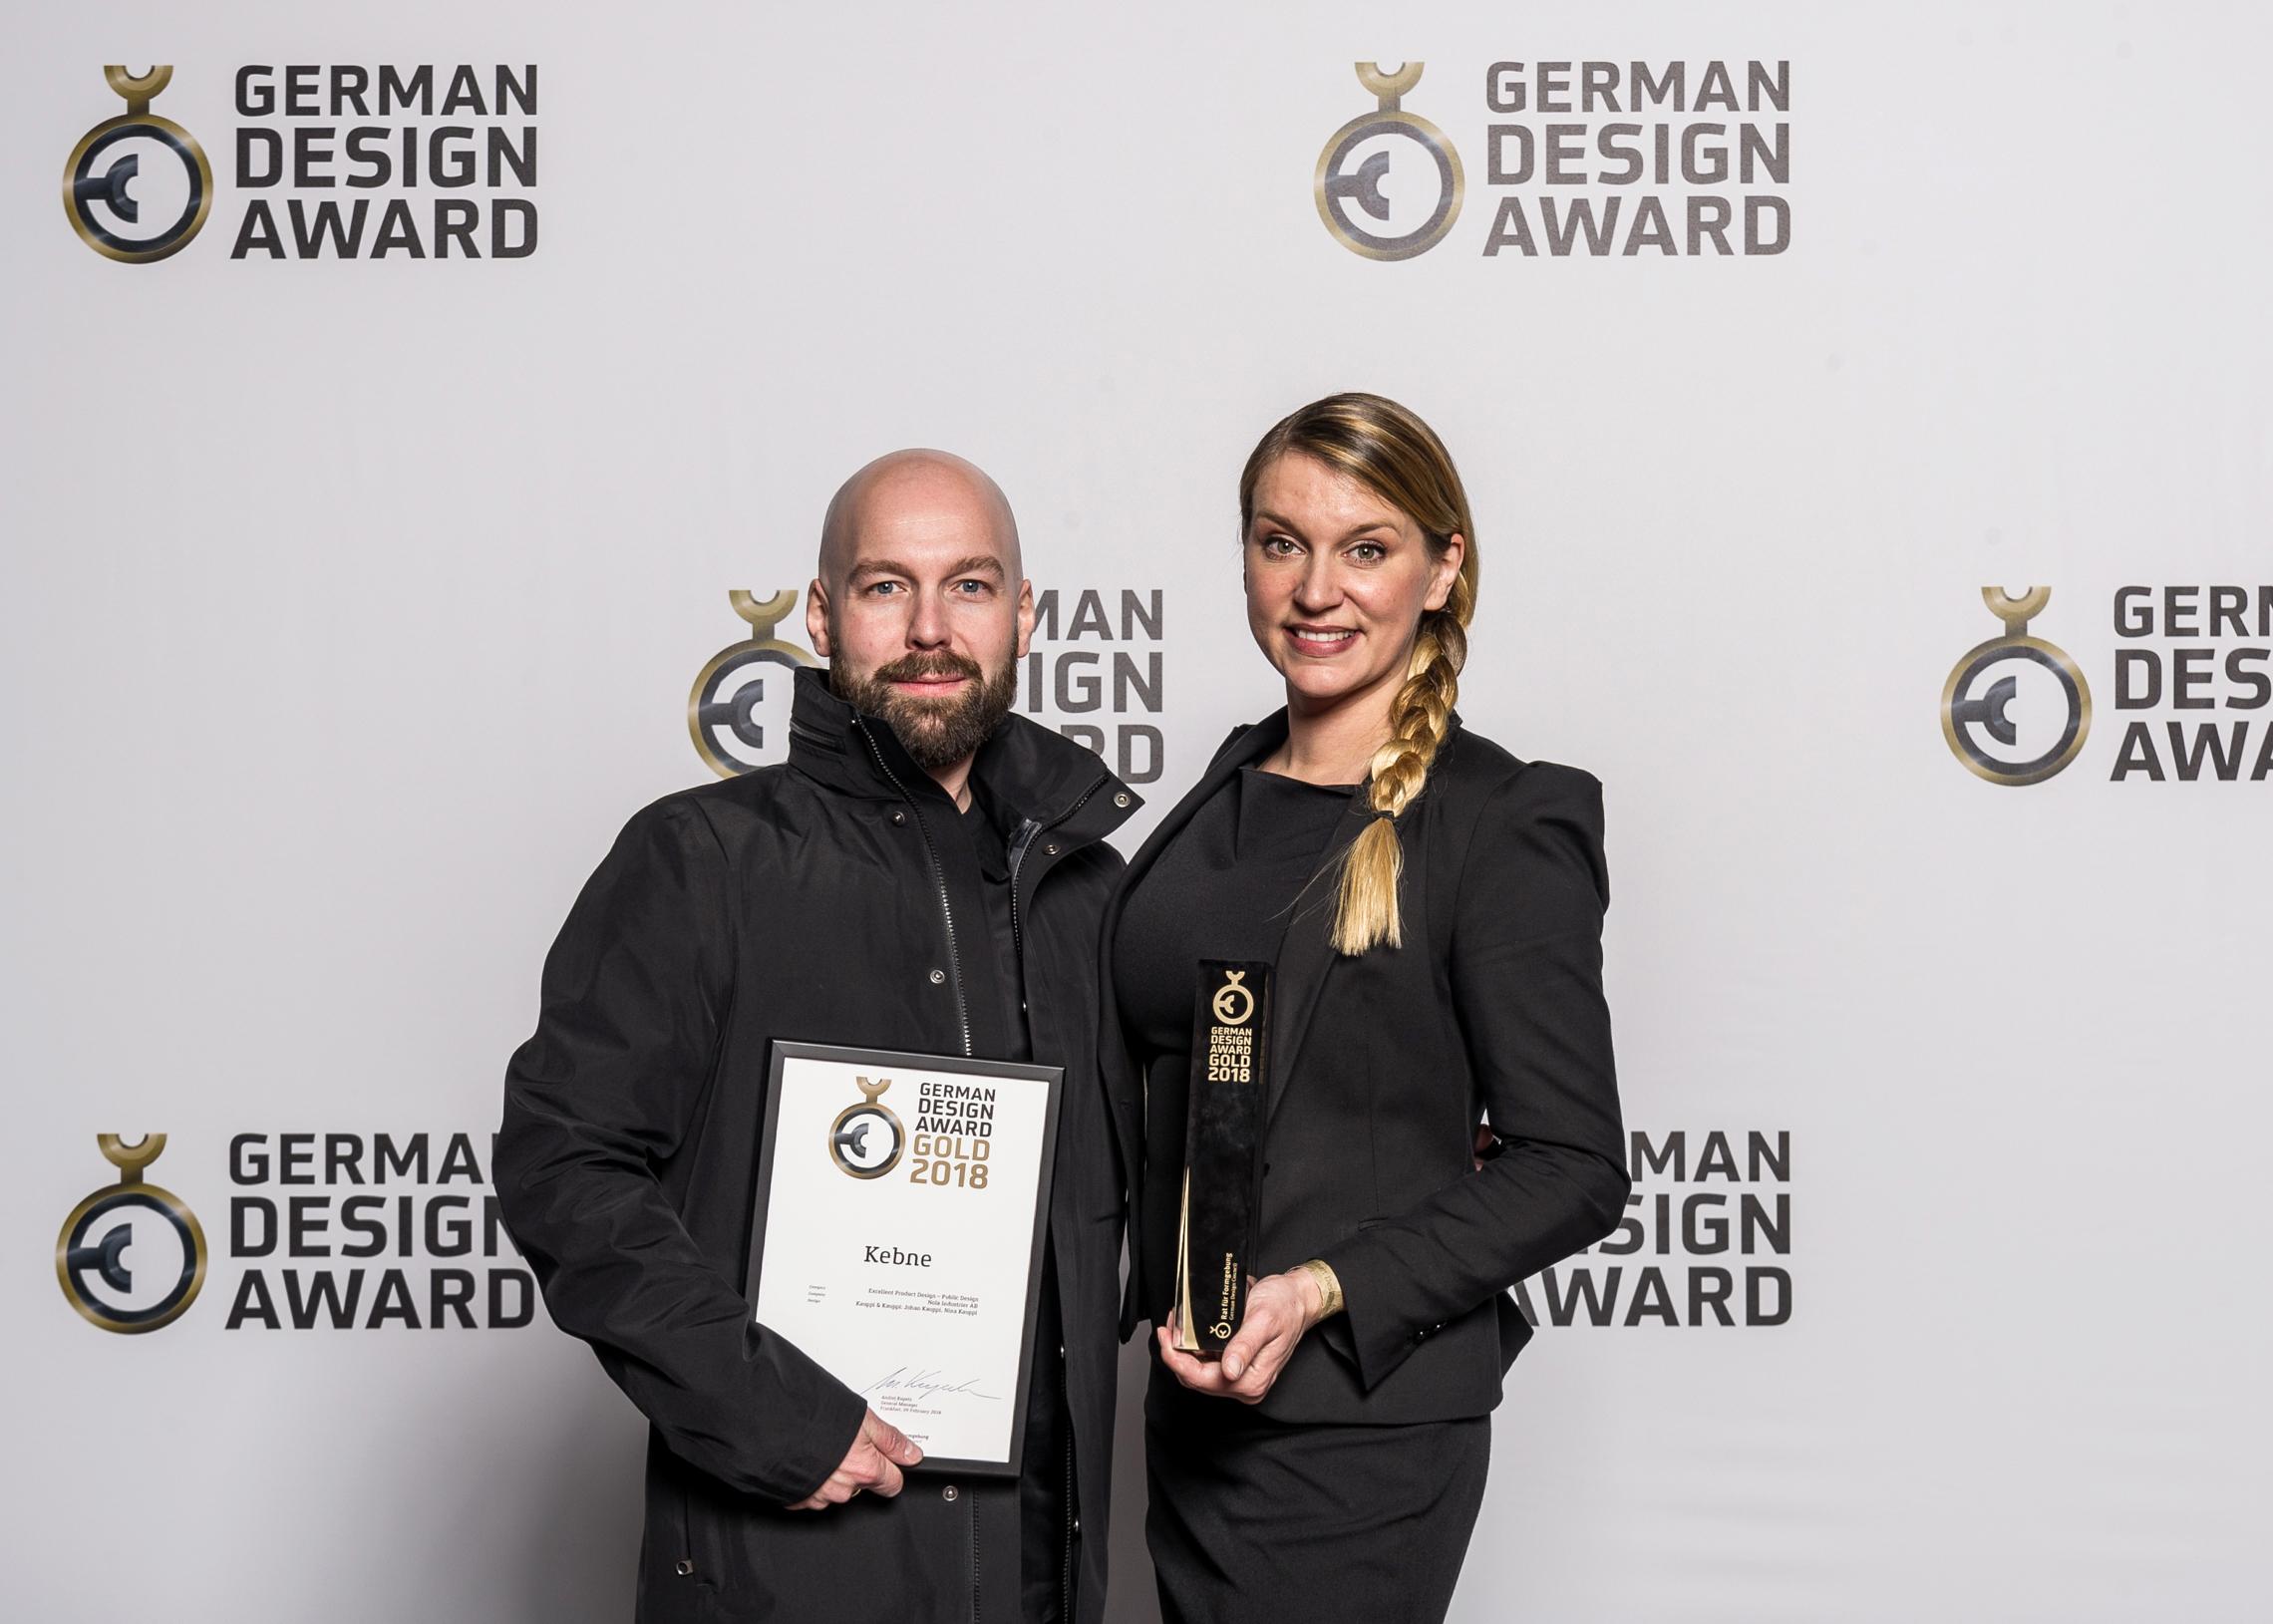 GDA 2018 - GOLD - Kebne by Nola - Design Kauppi & Kauppi - Johan Kauppi & Nina Kauppi